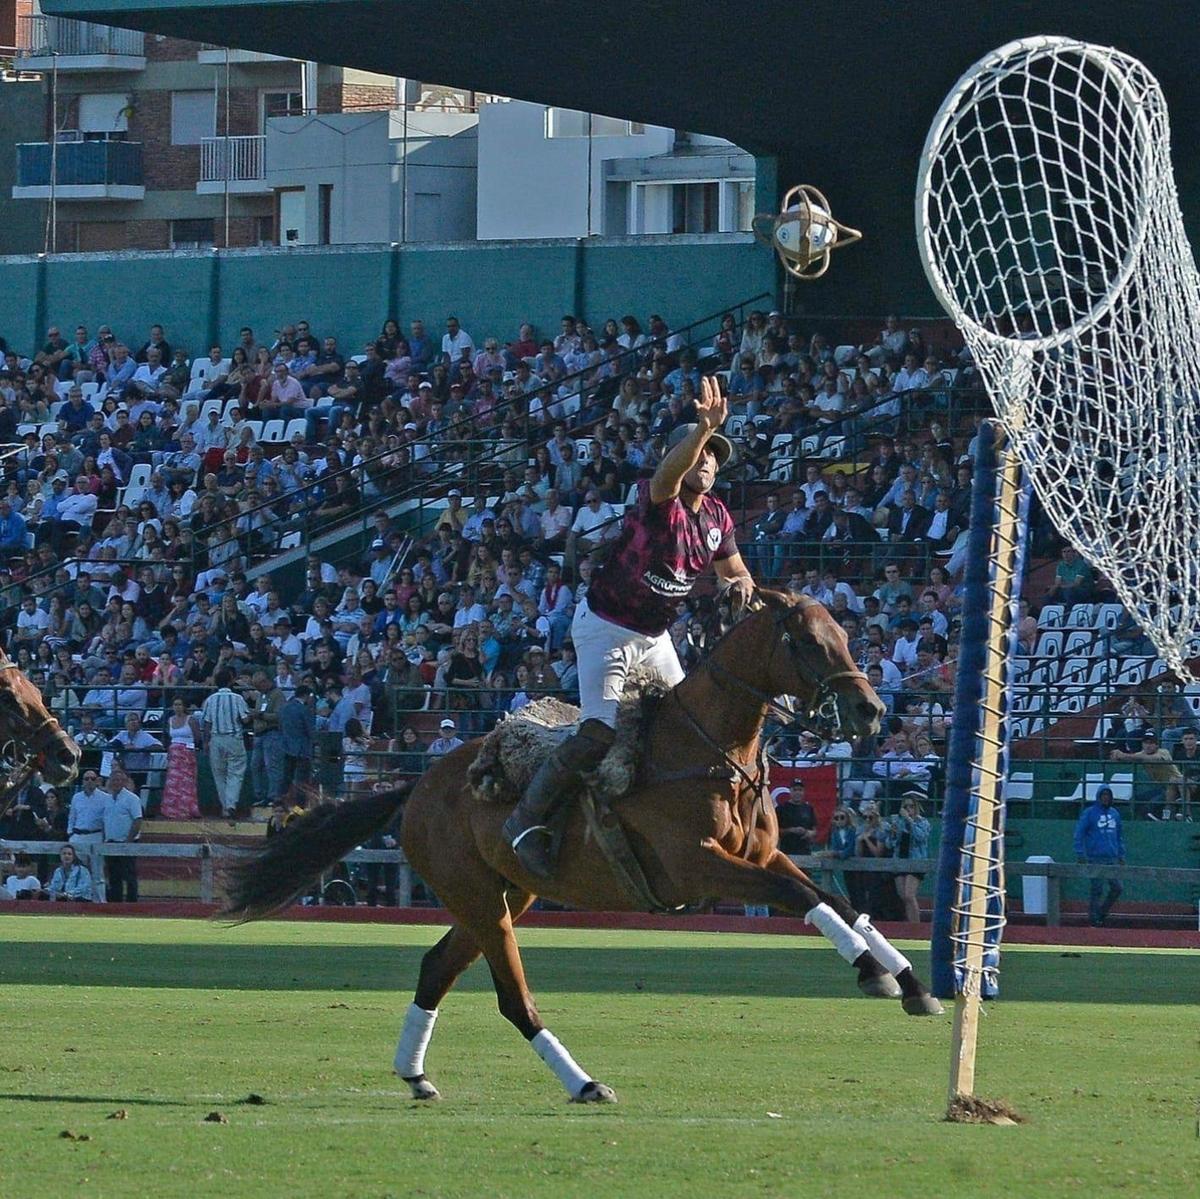 f:id:horseball:20200204213025j:plain